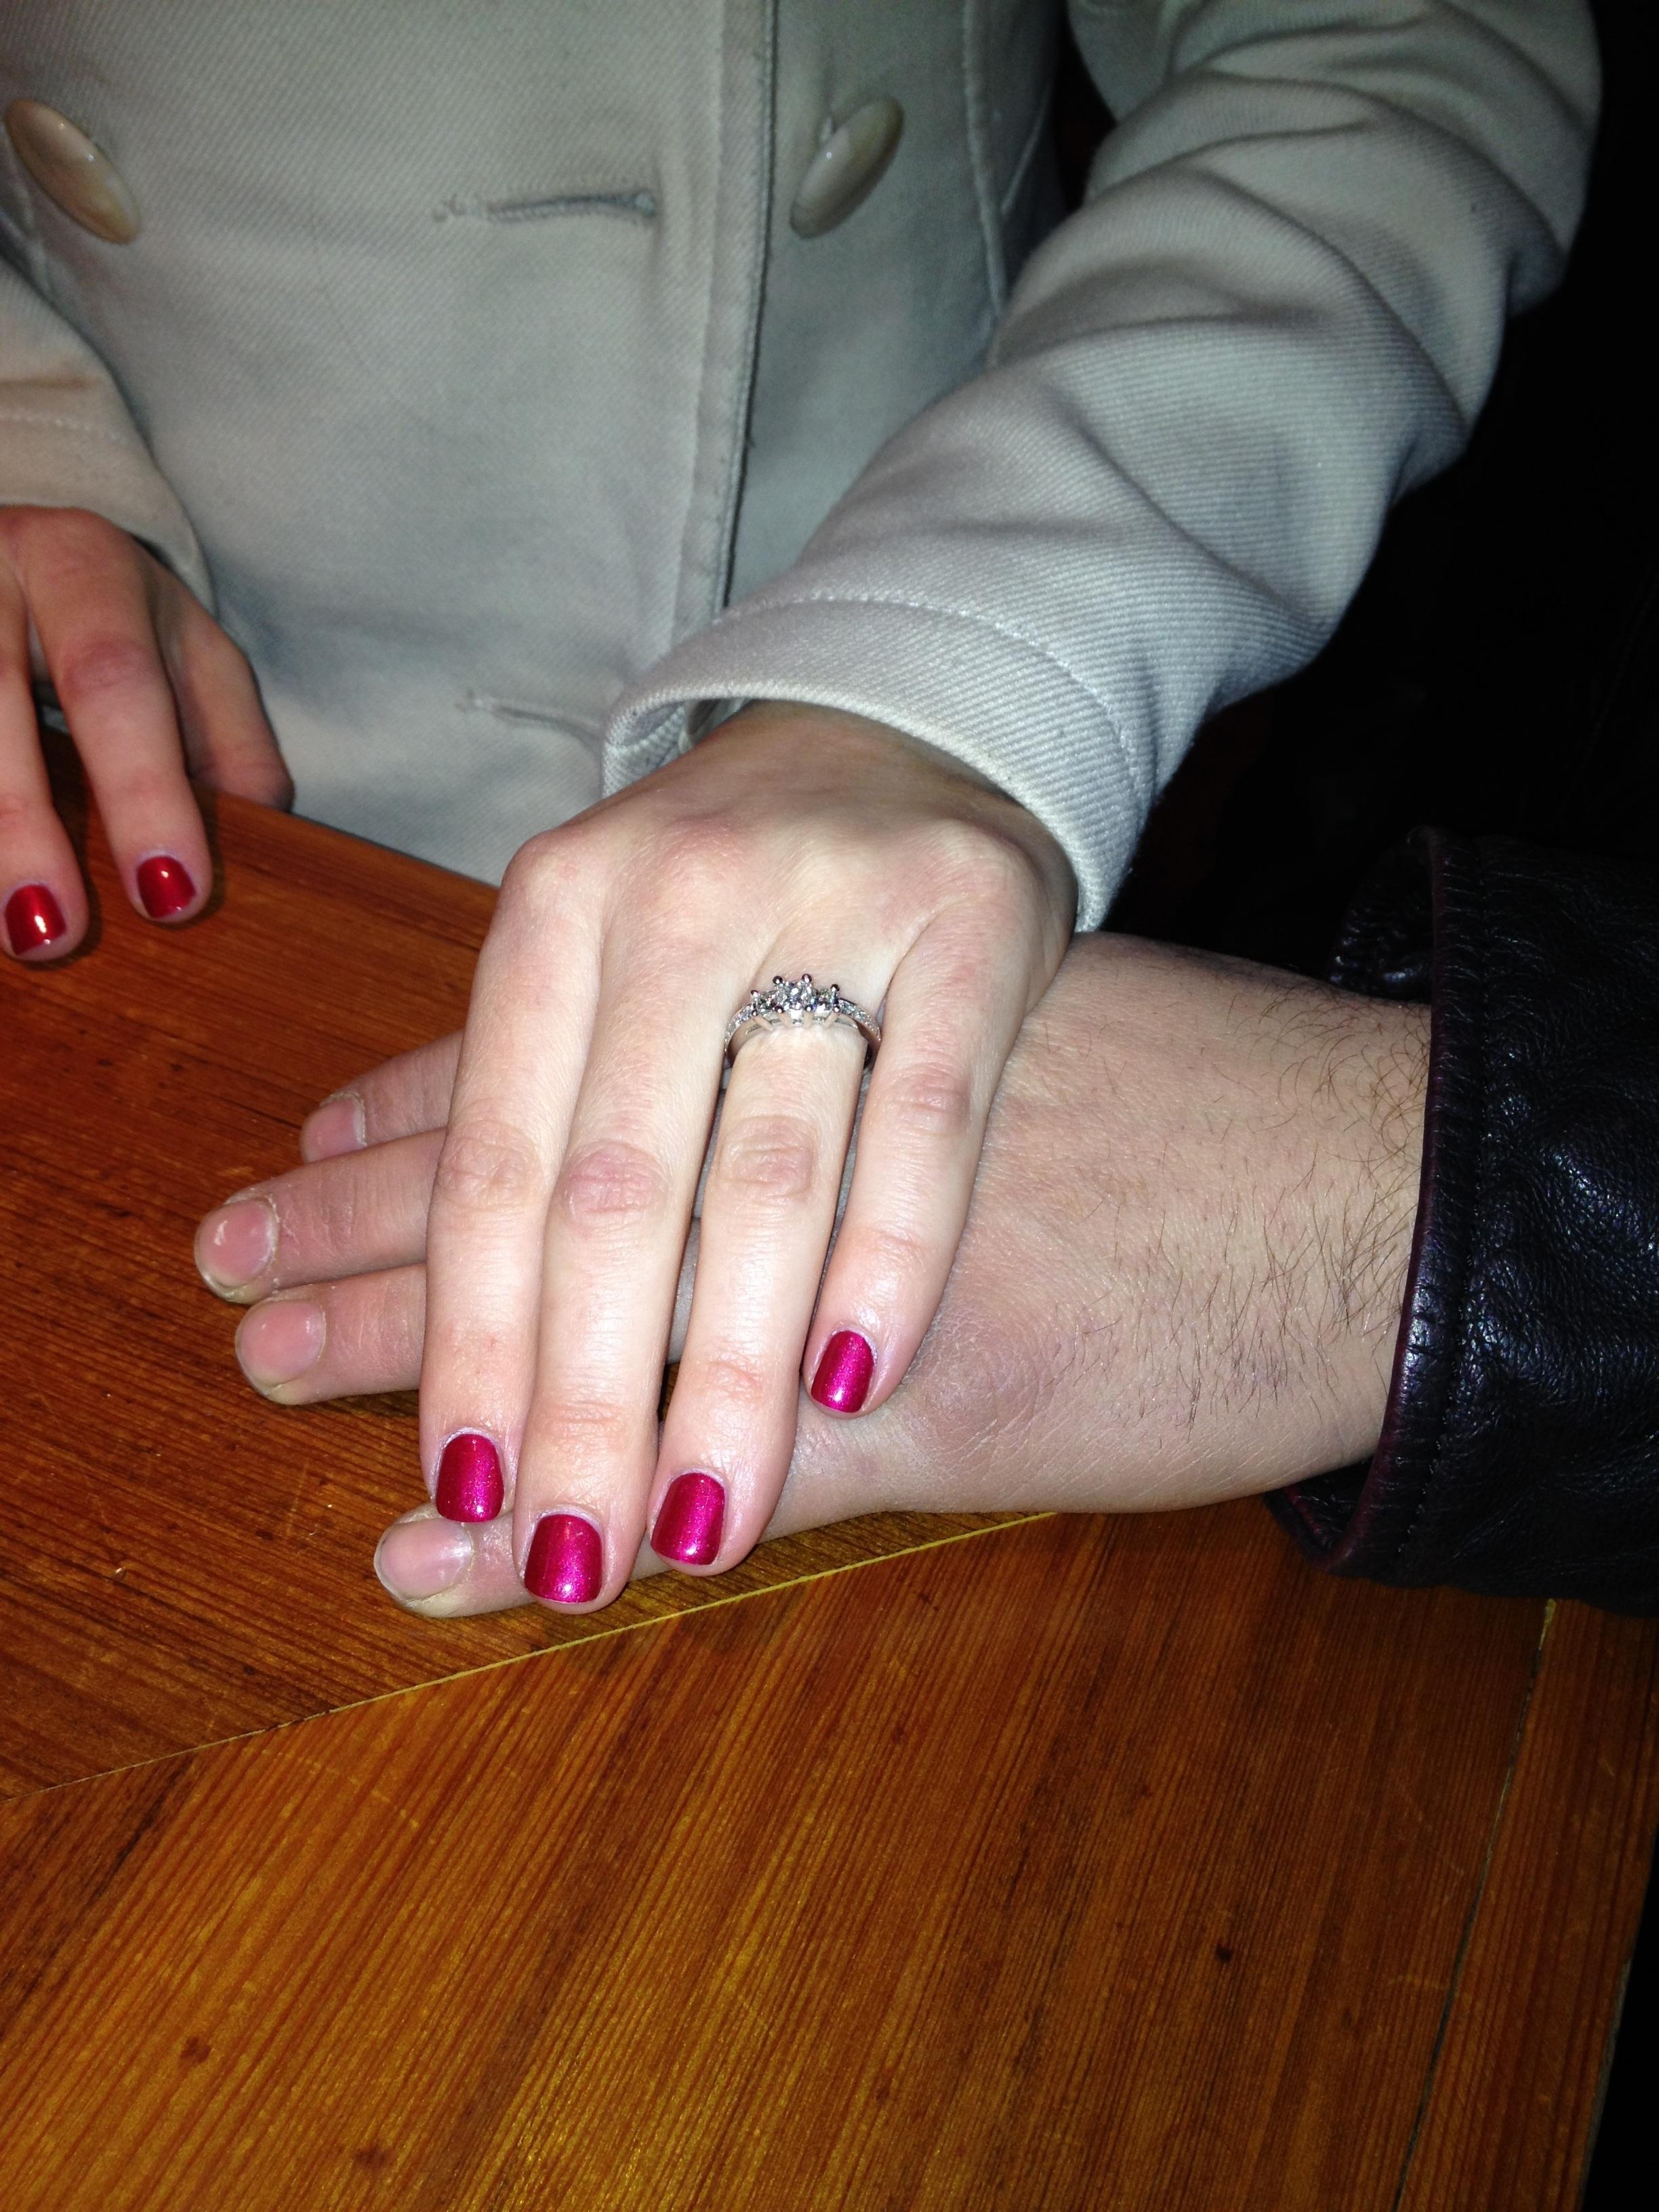 Fotos gratis : mano, hombre, mujer, masculino, hembra, pierna, toque ...